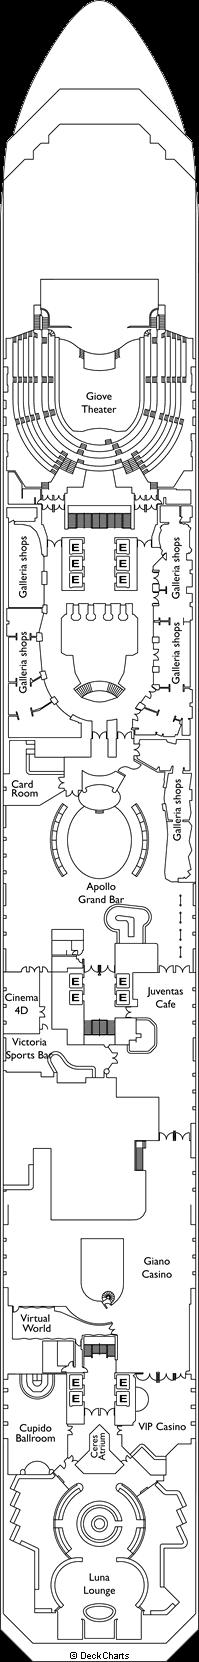 Costa Serena: Gemini Deck